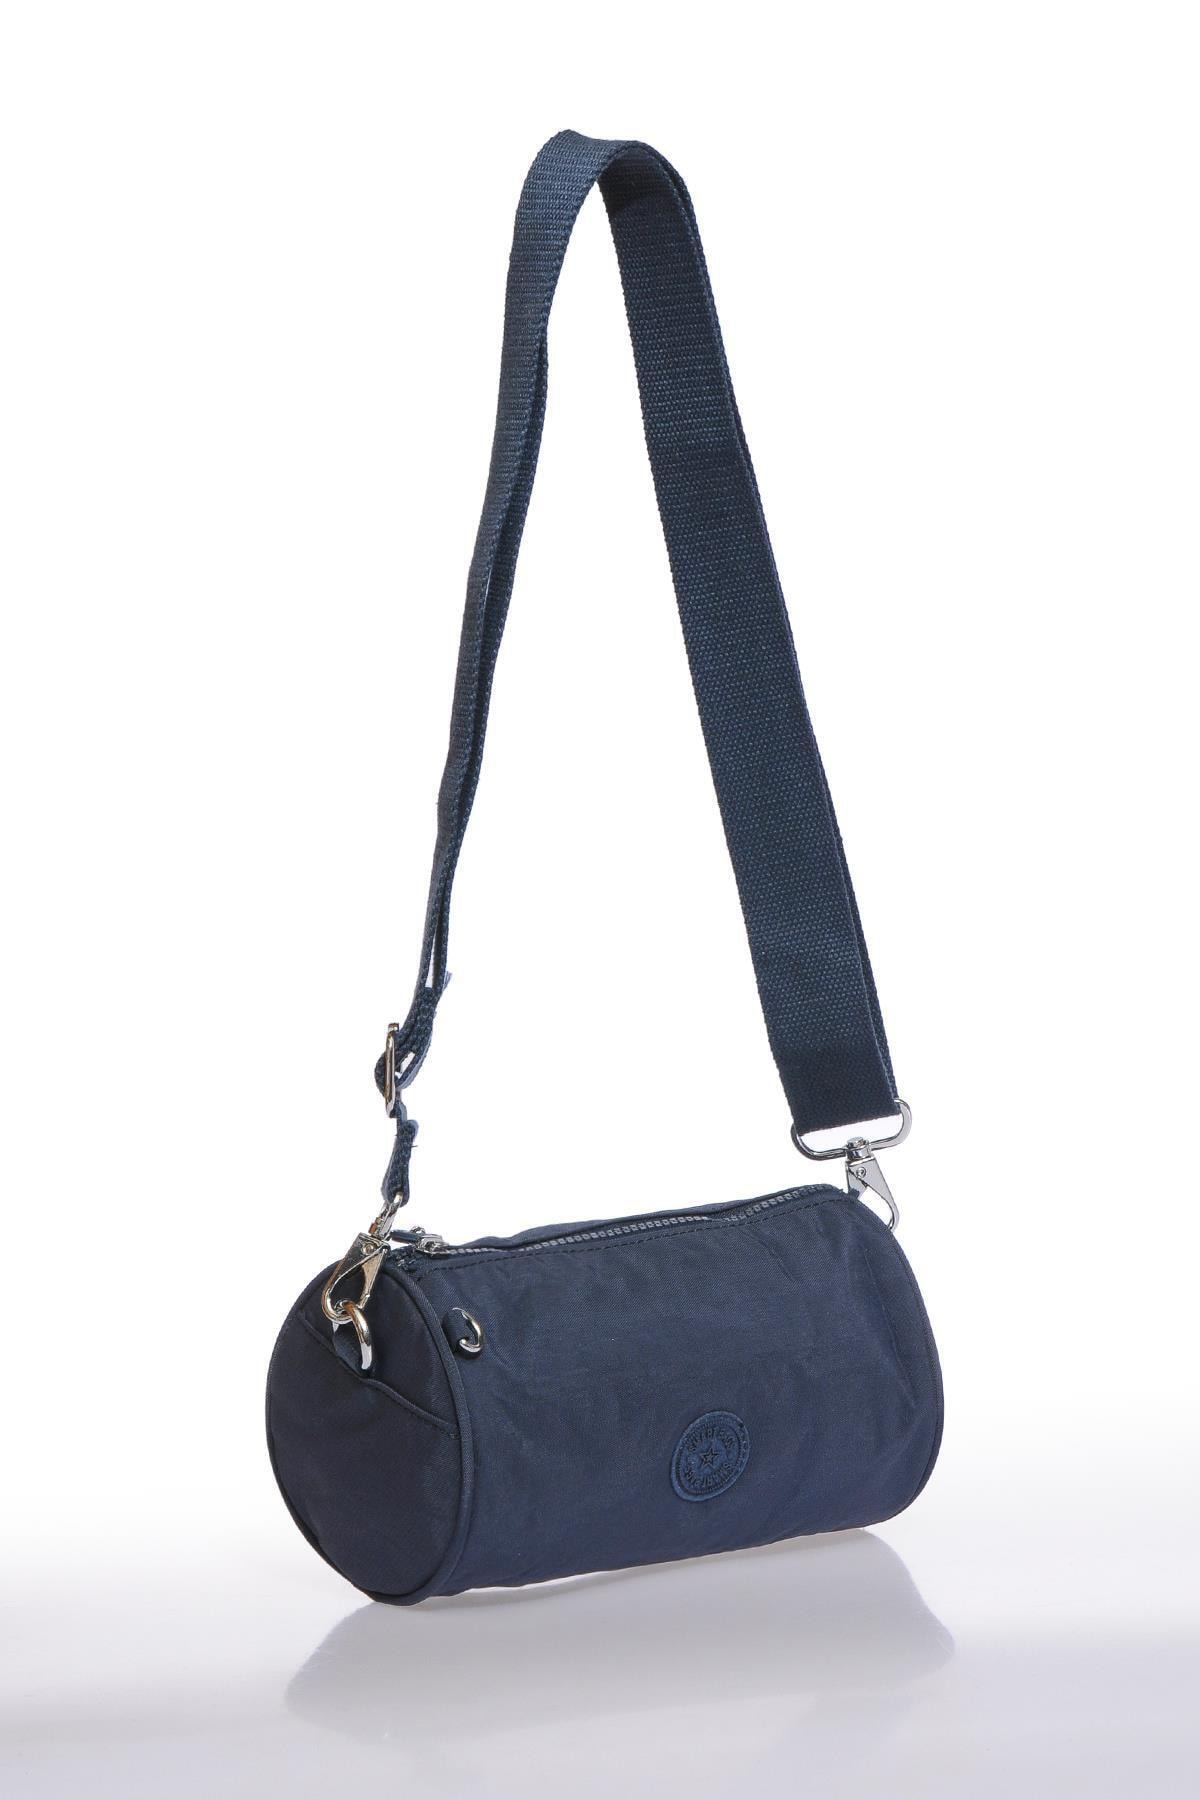 SMART BAGS Smb3025-0033 Lacivert Kadın Çapraz Çanta 2